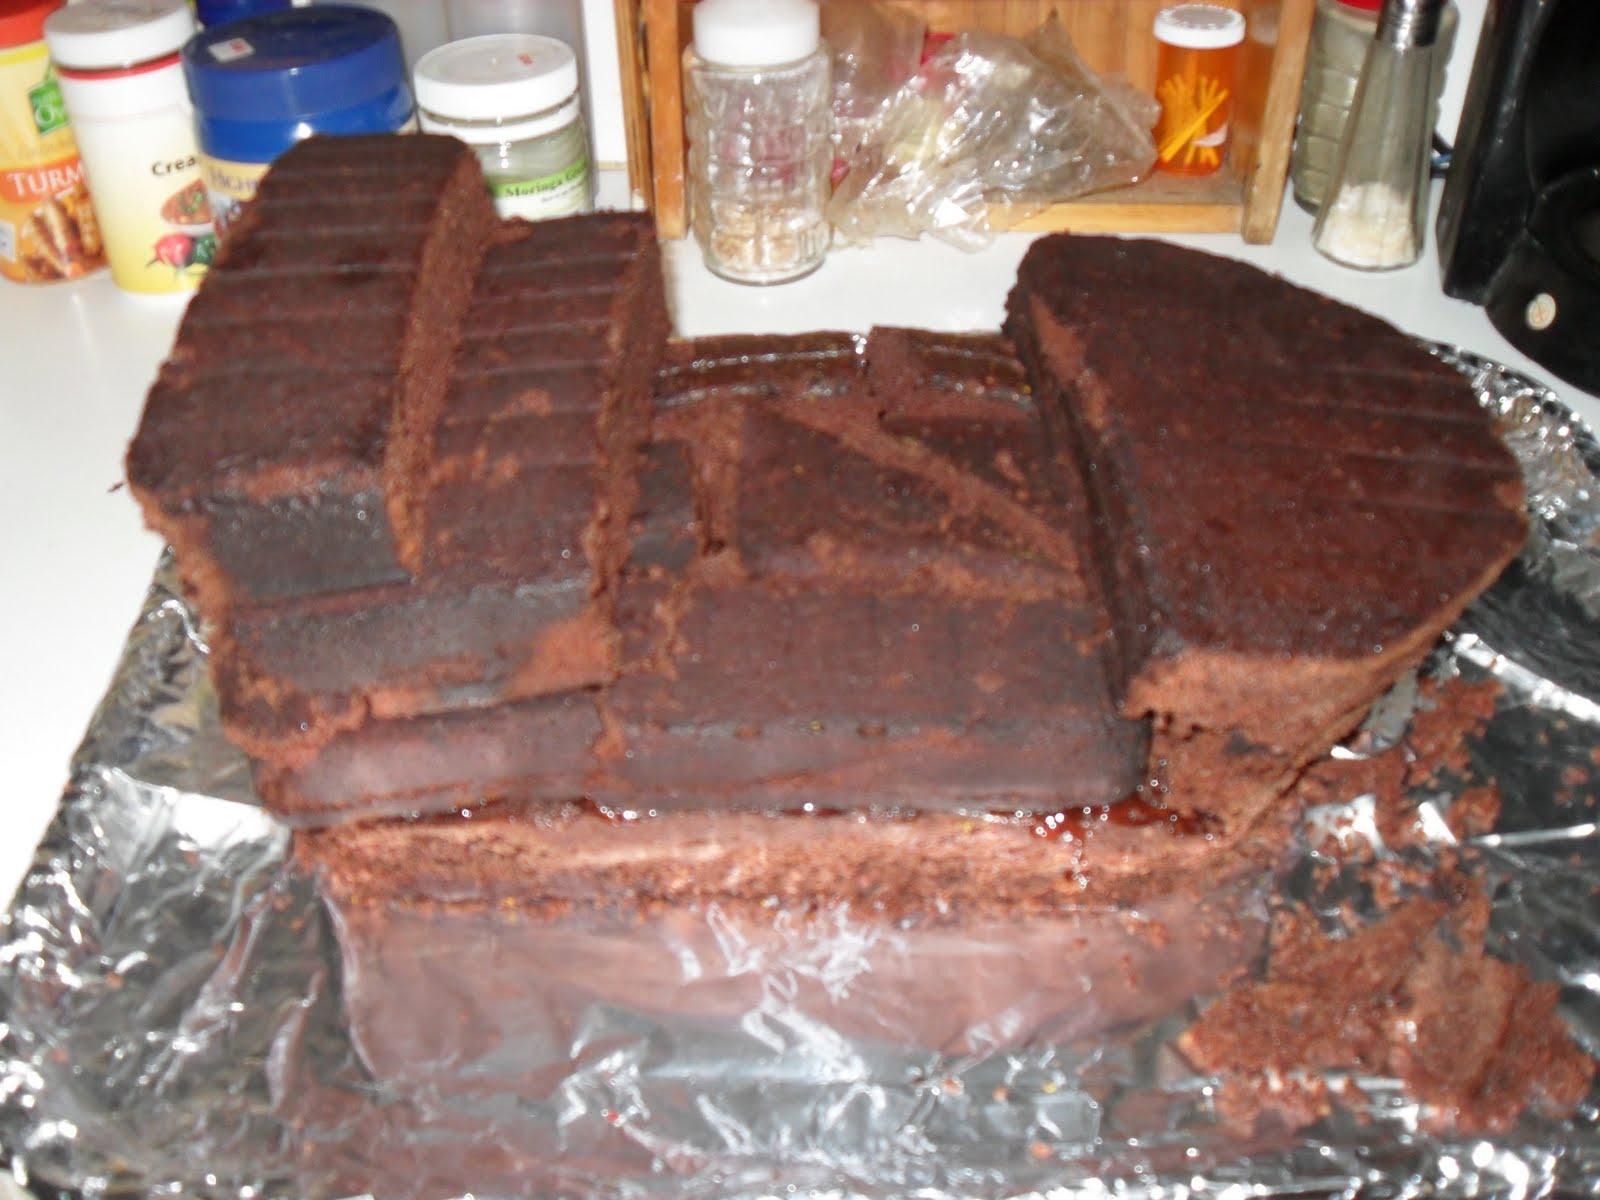 Novelty Cake Designs How to Make a Pirate Ship Cake and Treasure